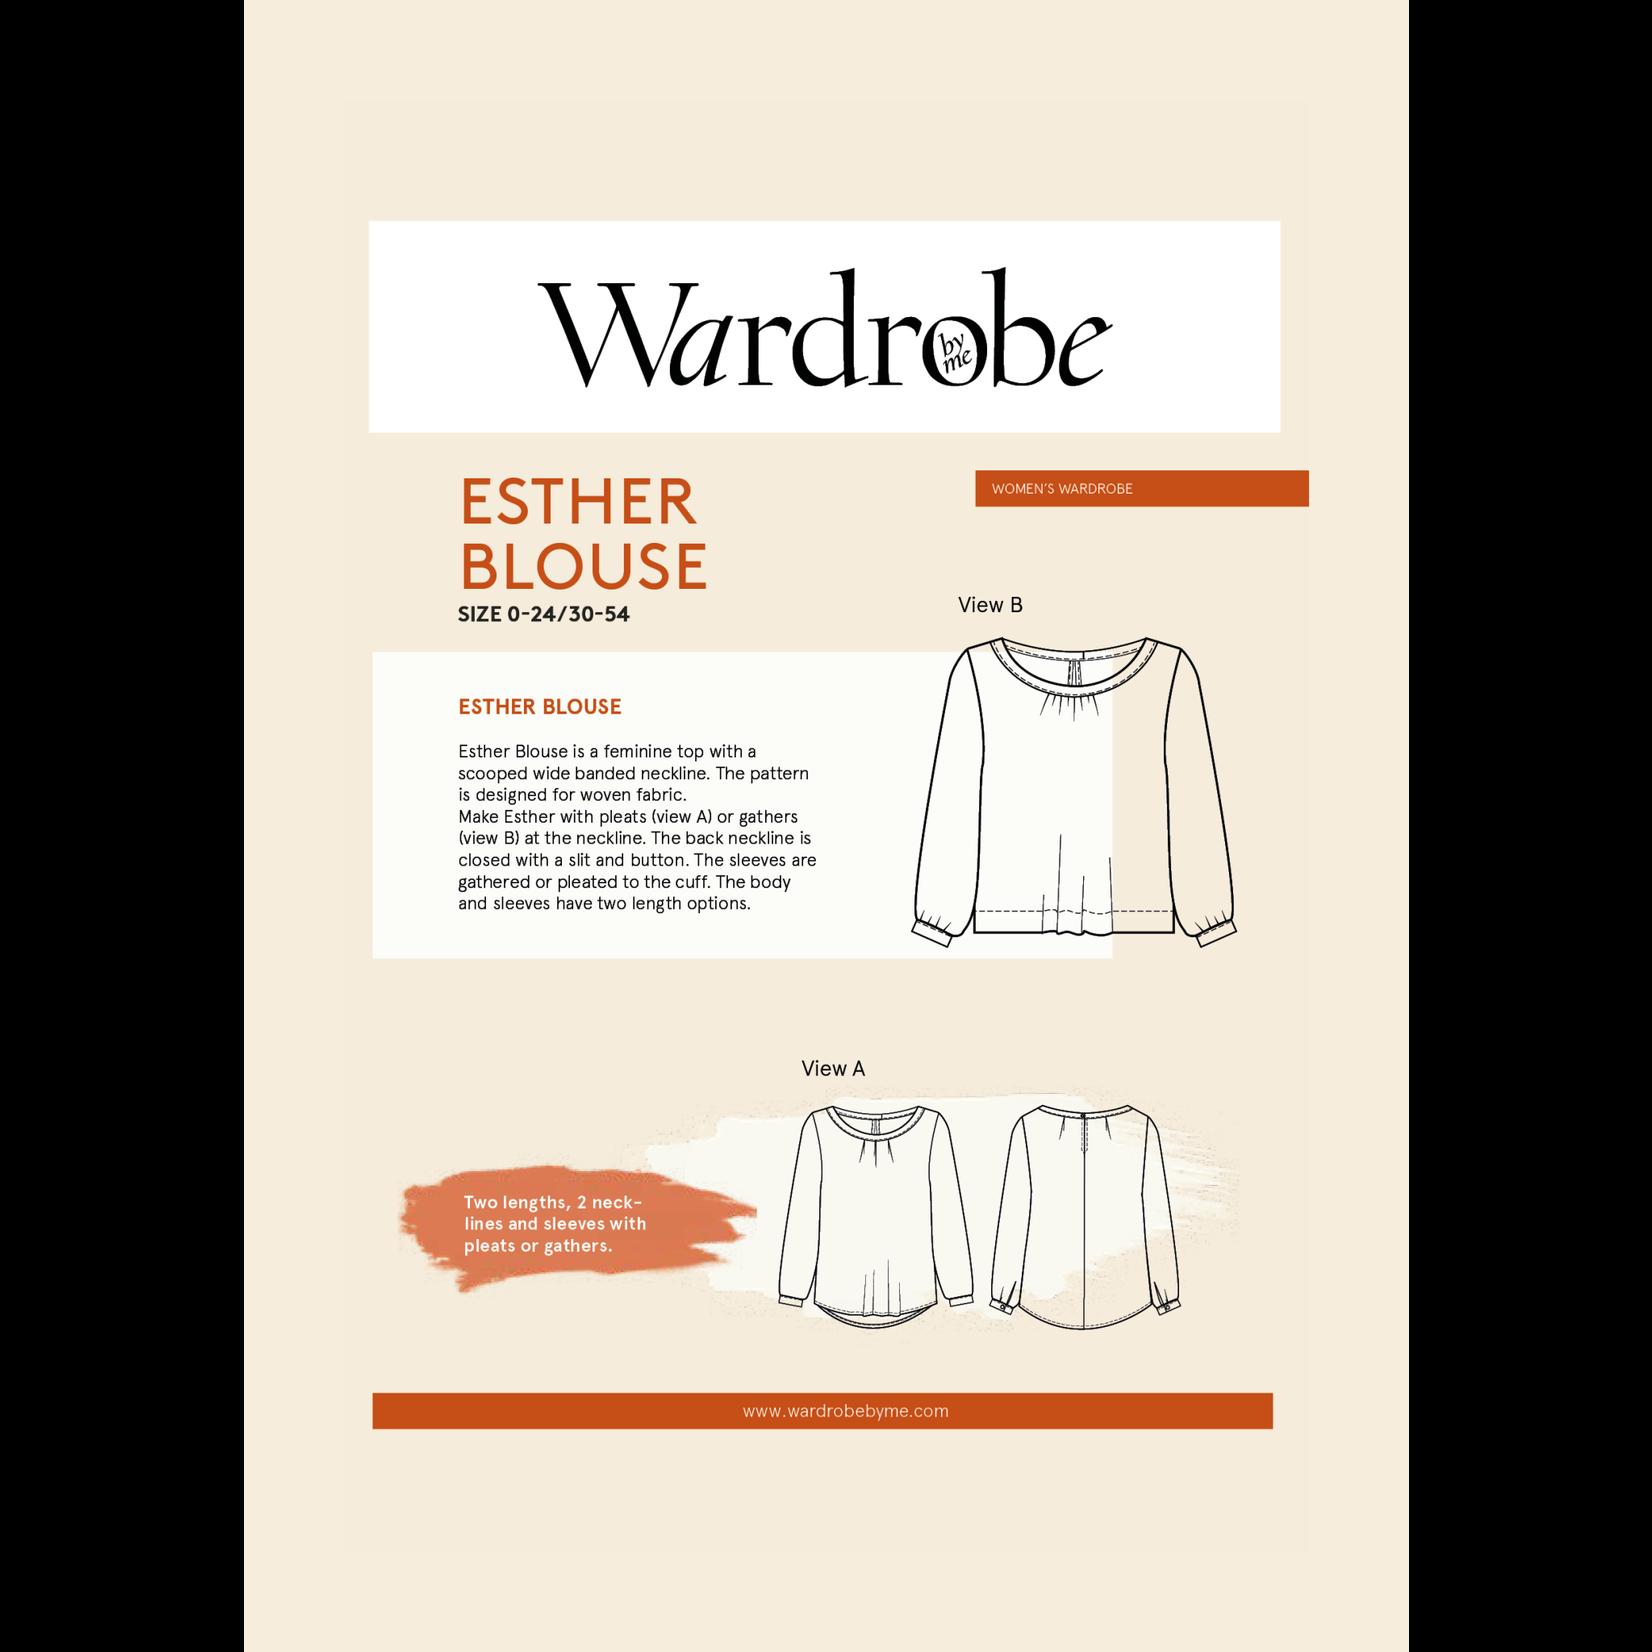 Wardrobe by Me Esther Blouse Pattern 0-24 (30-54)